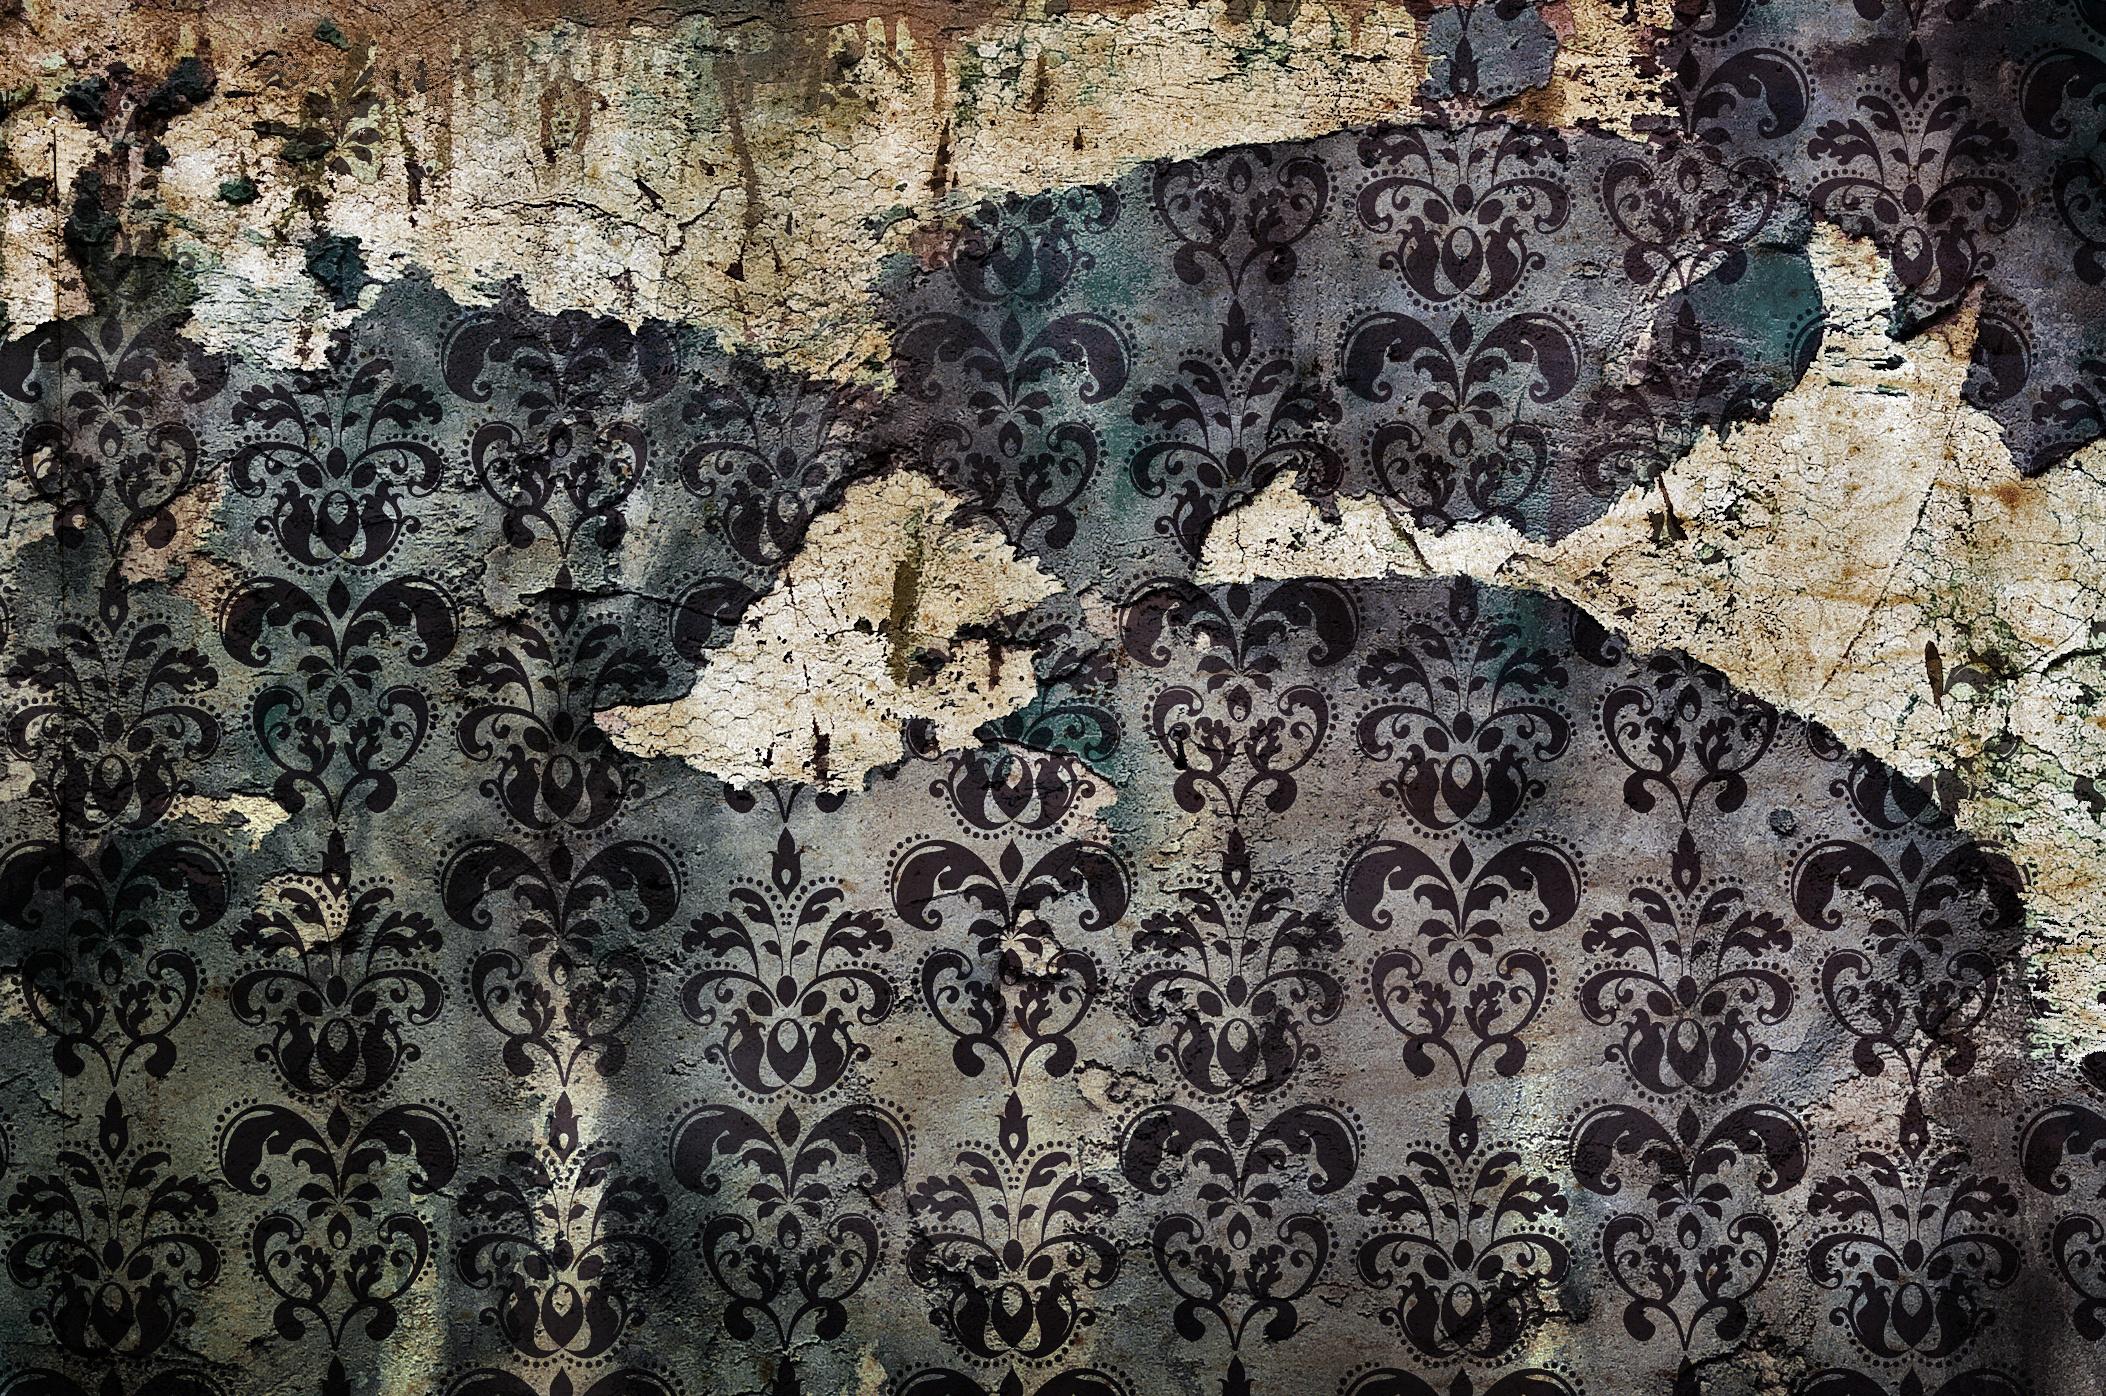 wallpaper Patterns OldtimeWallpaperscom Antique wallpapers. ← Torn Wallpaper Wallcoverings